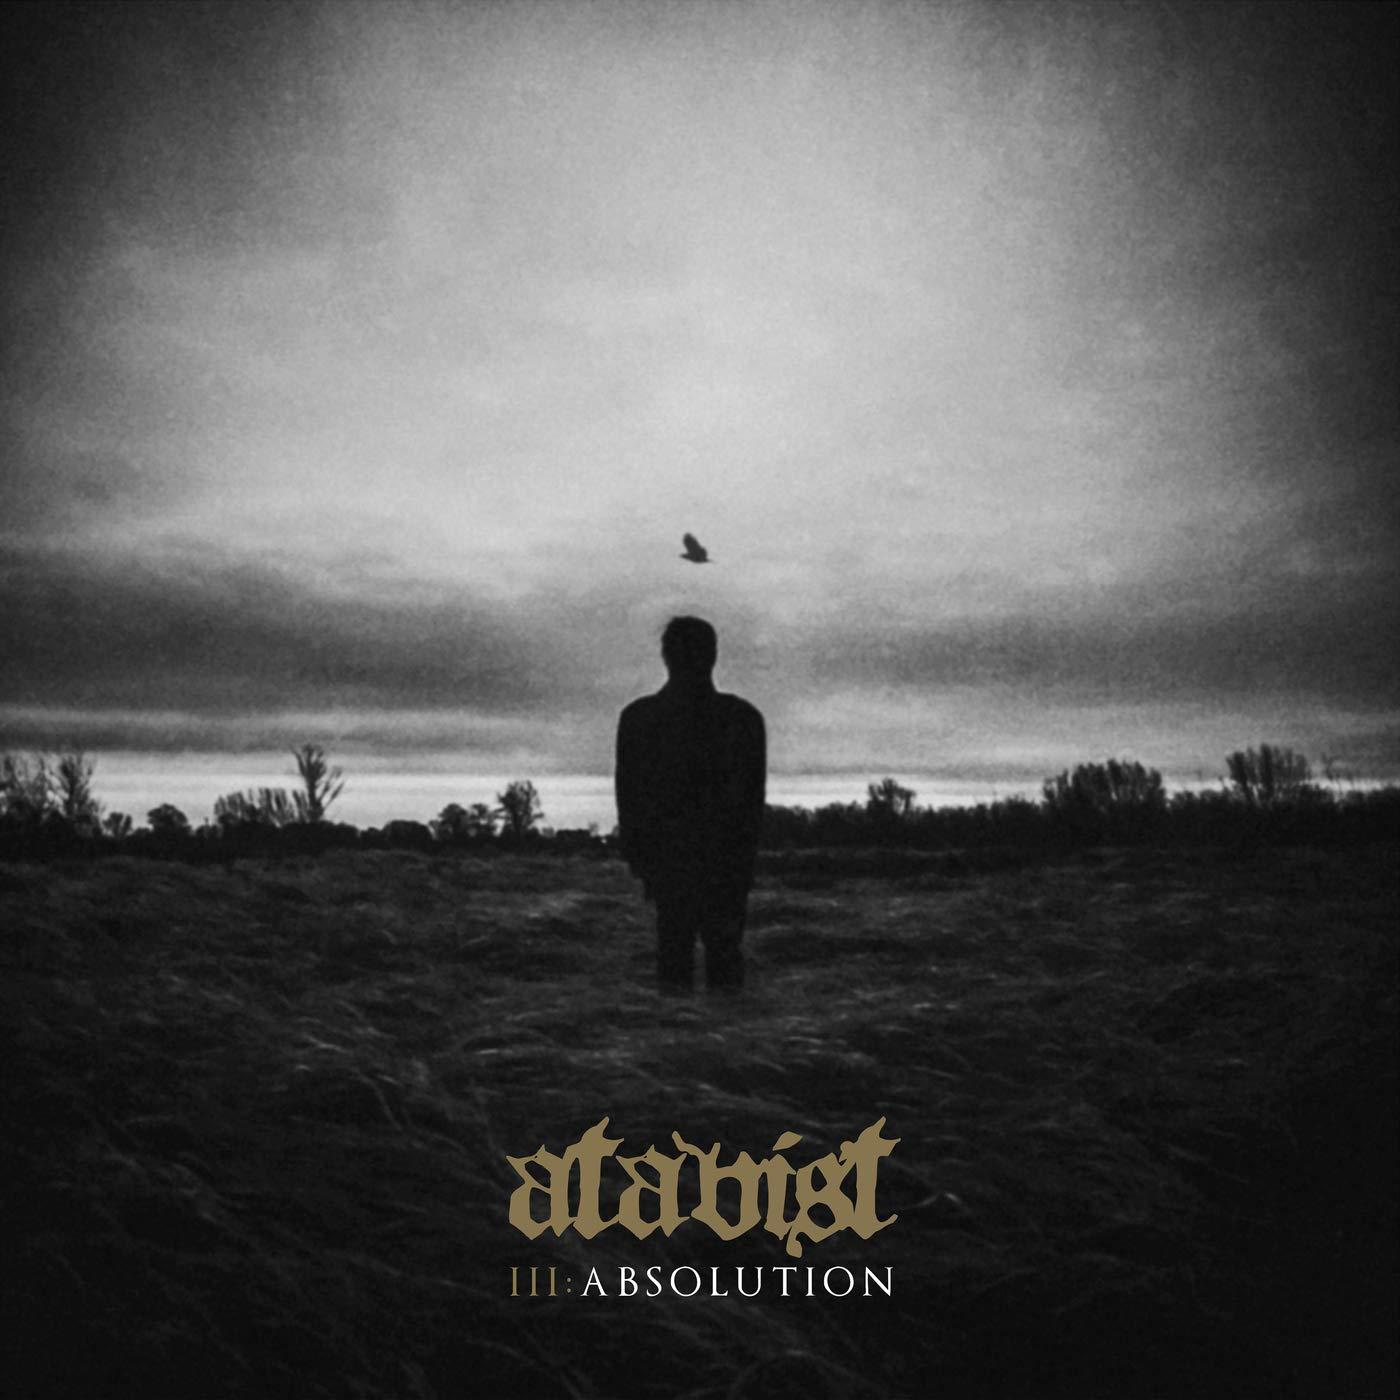 Atavist – III: Absolution (2020) [FLAC]